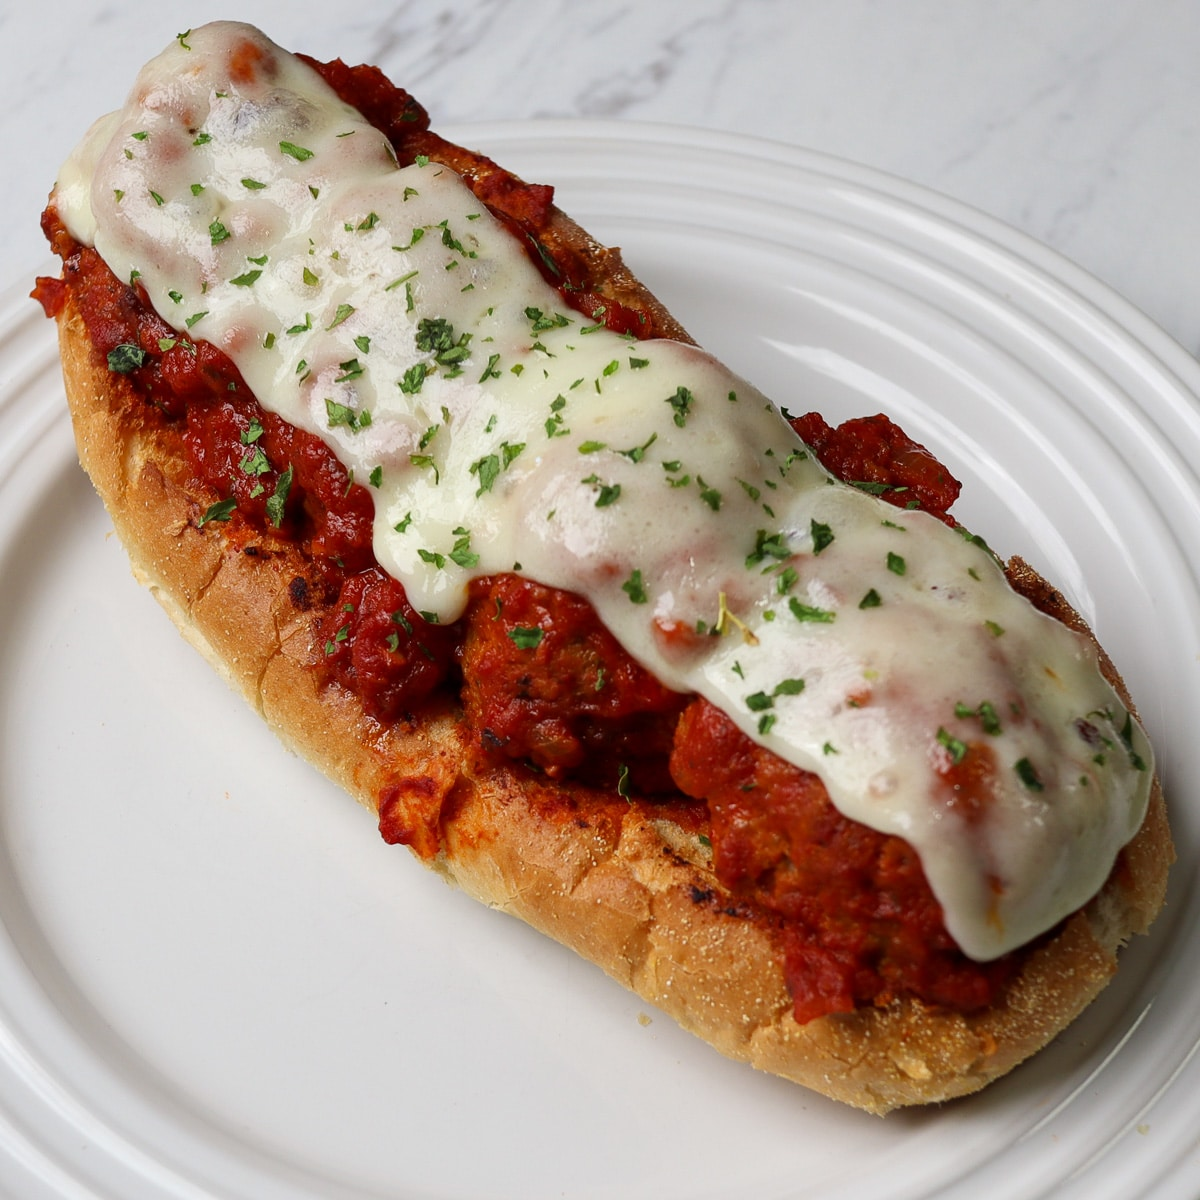 meatball sub on a plate